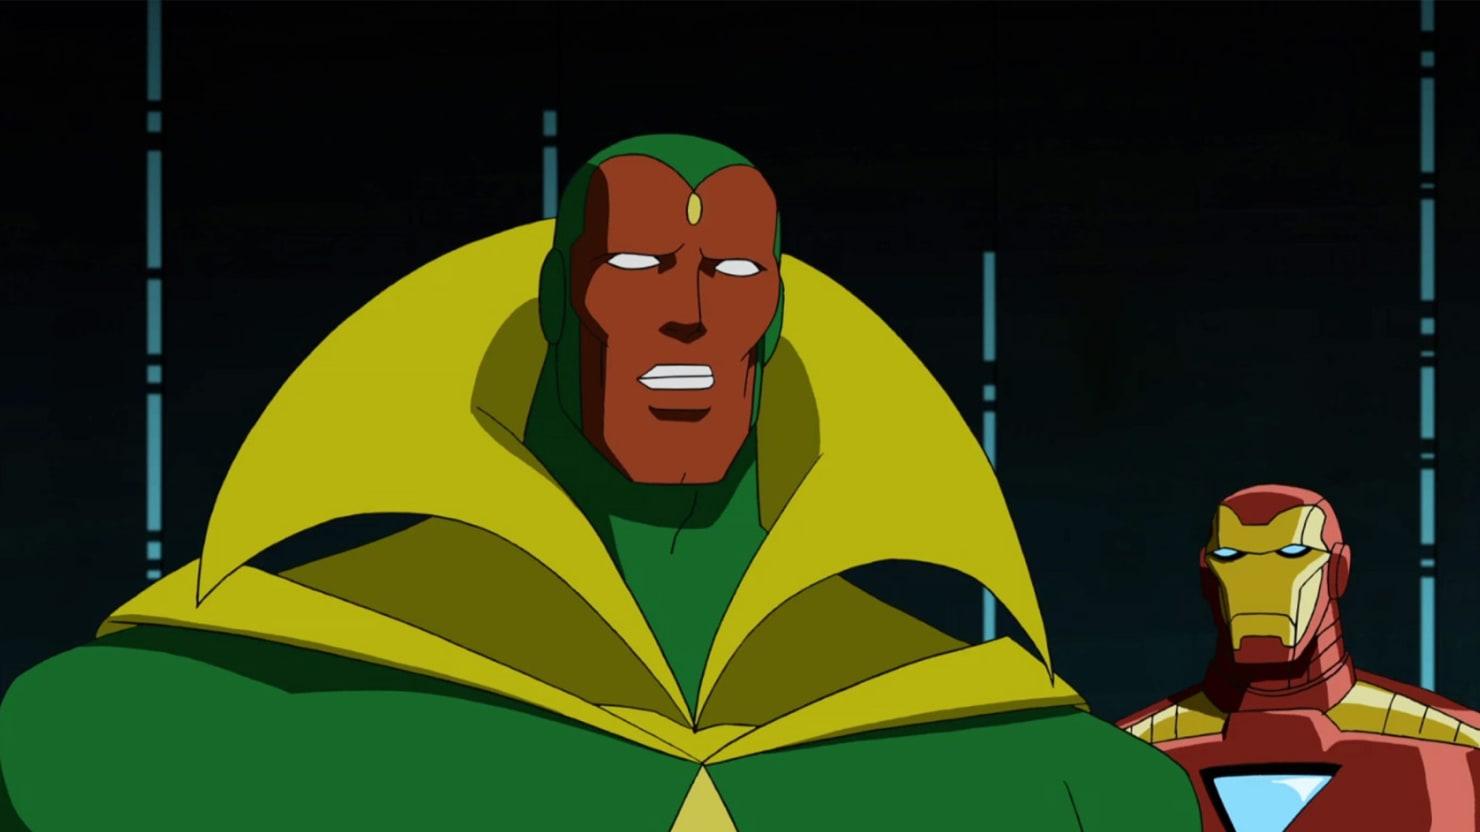 'Avengers: Age of Ultron's' Secret Vision: Meet the Mysterious New Avenger